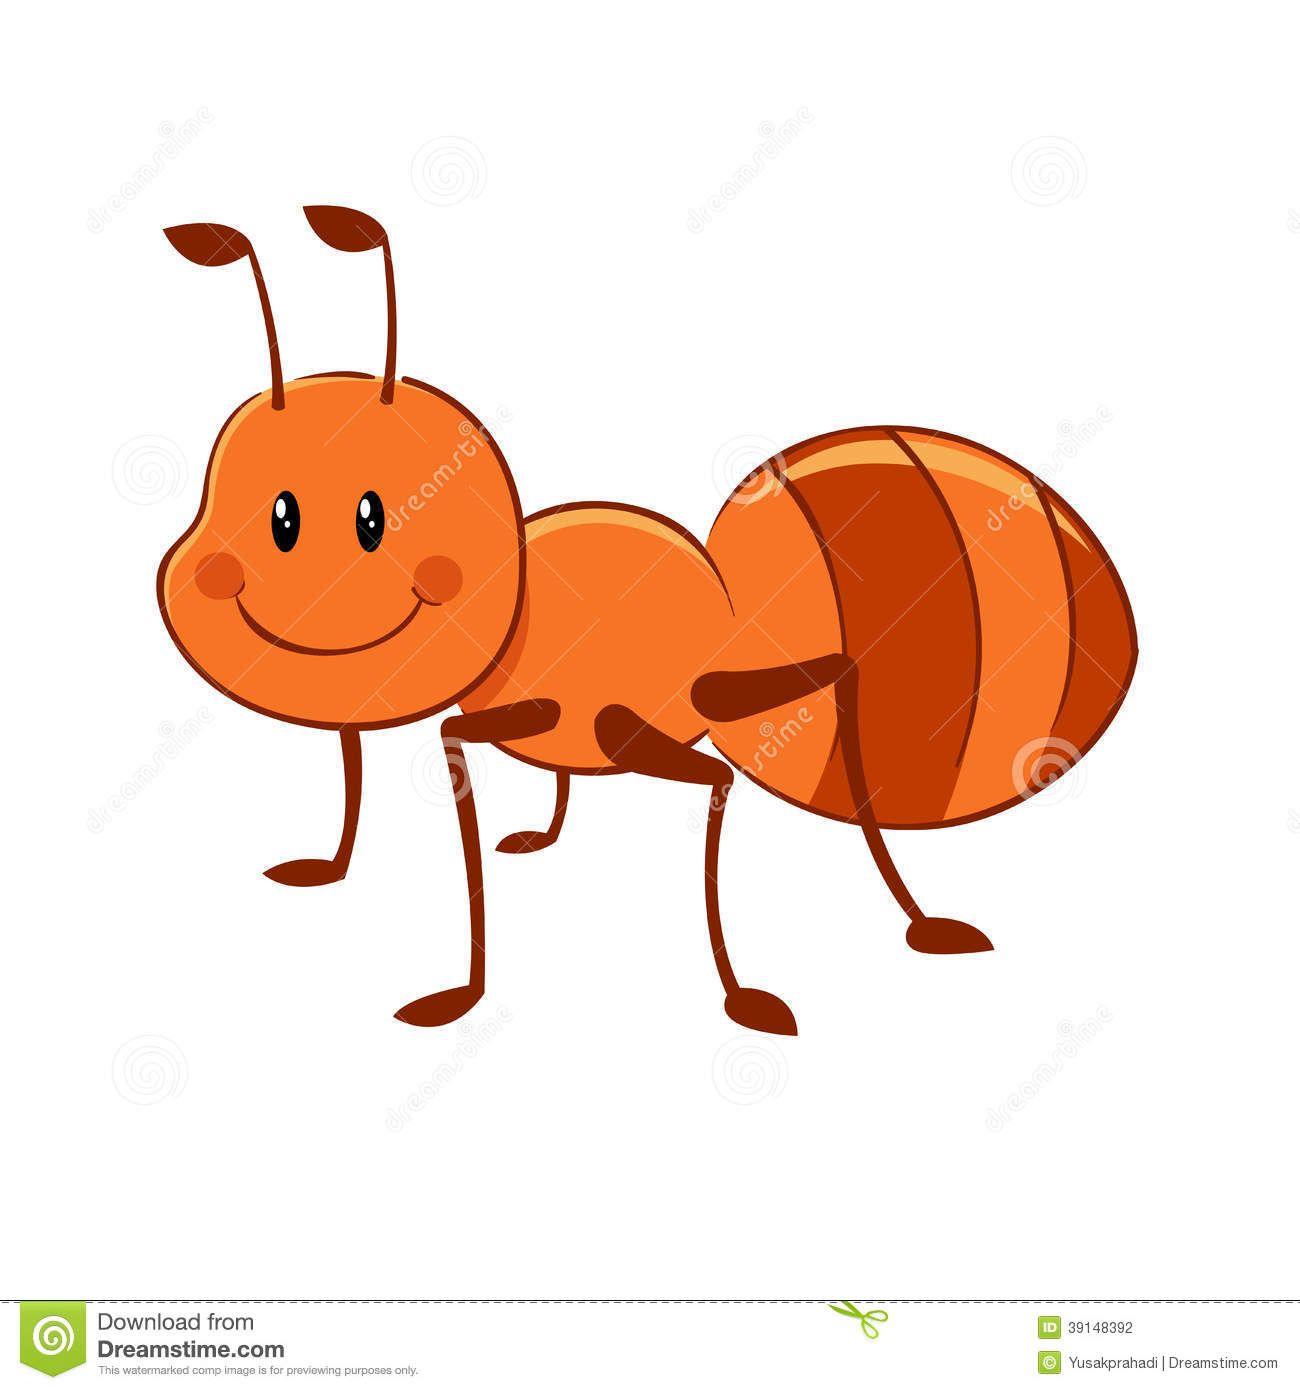 Ant clipart children's. Cartoon mascot stock photo